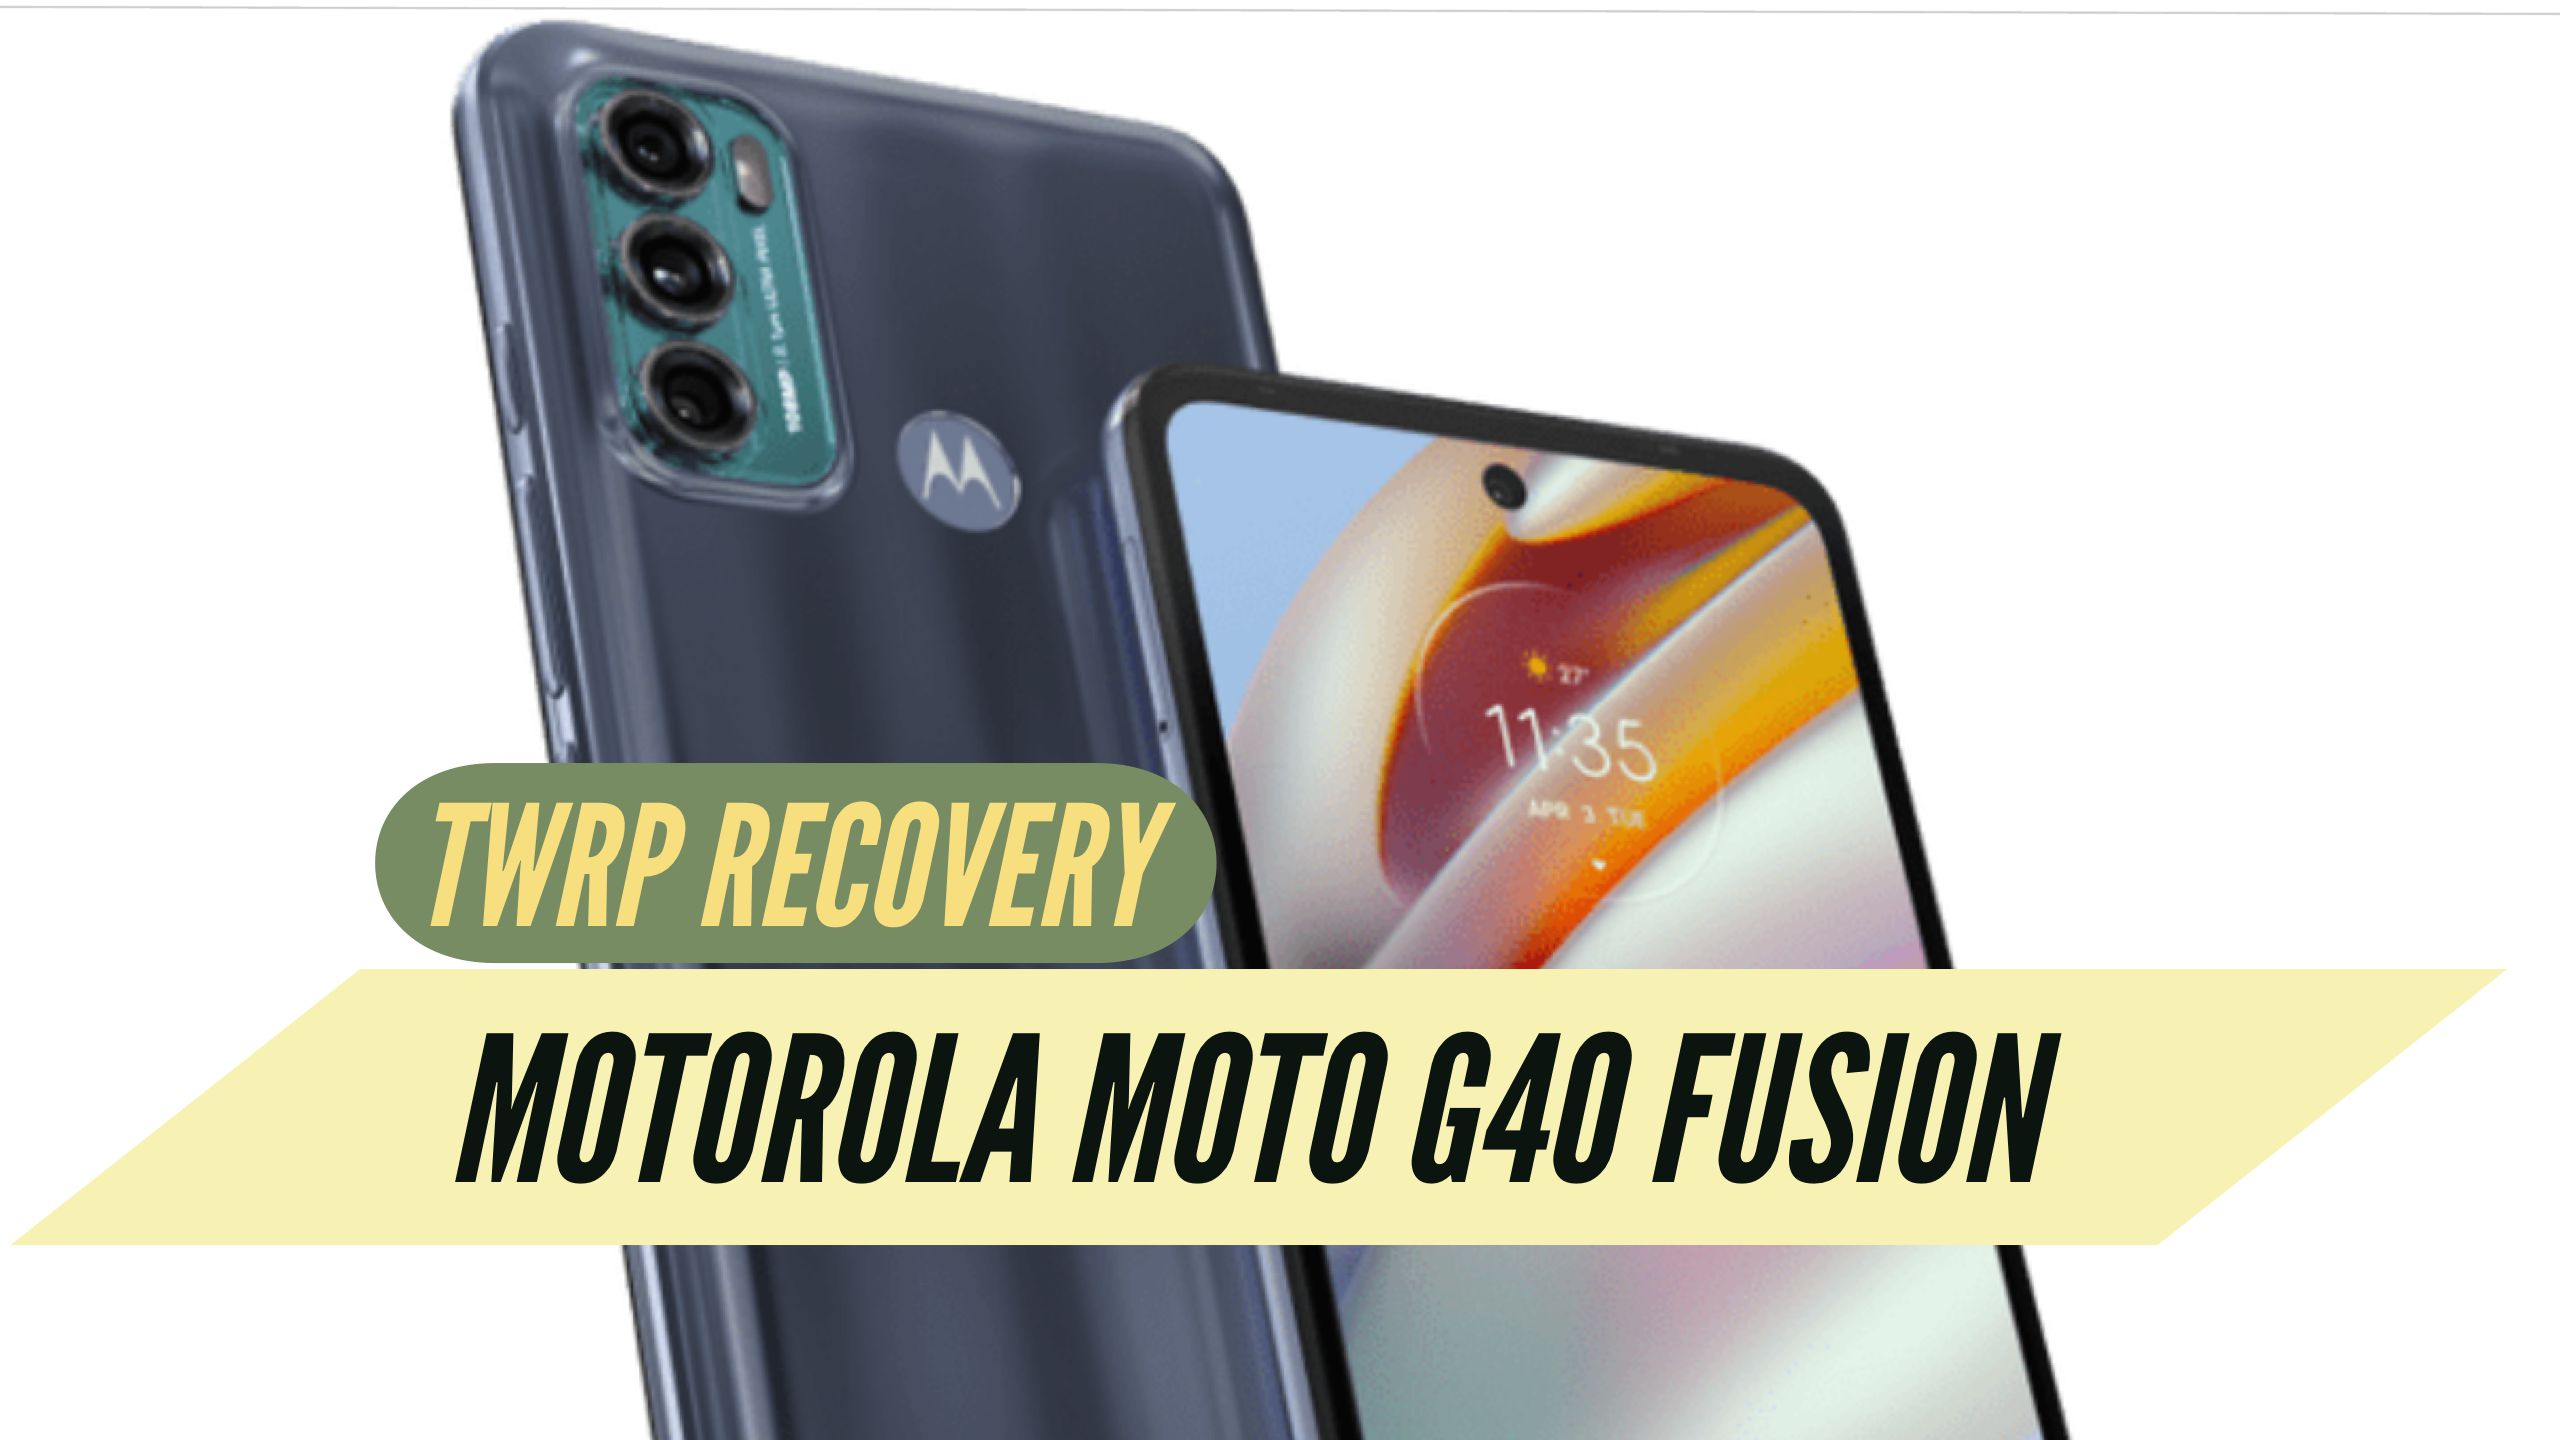 Motorola Moto G40 Fusion TWRP Recovery